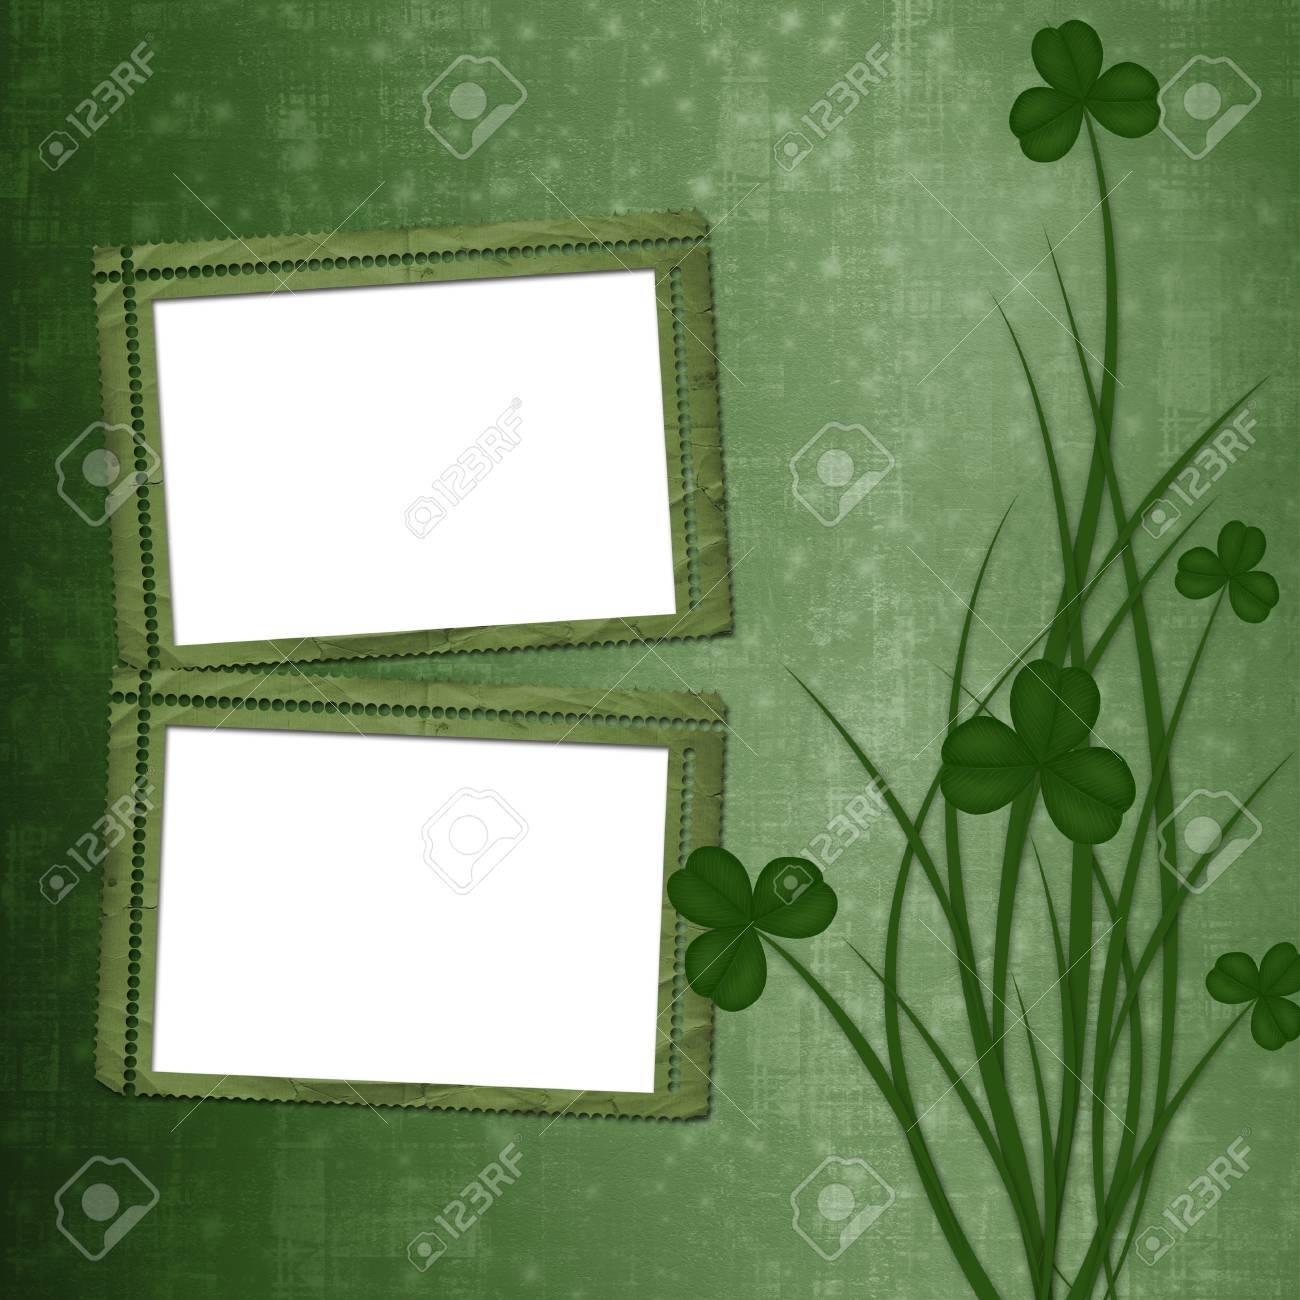 Design for St. Patrick's Day. Flower ornament. Stock Photo - 17918567